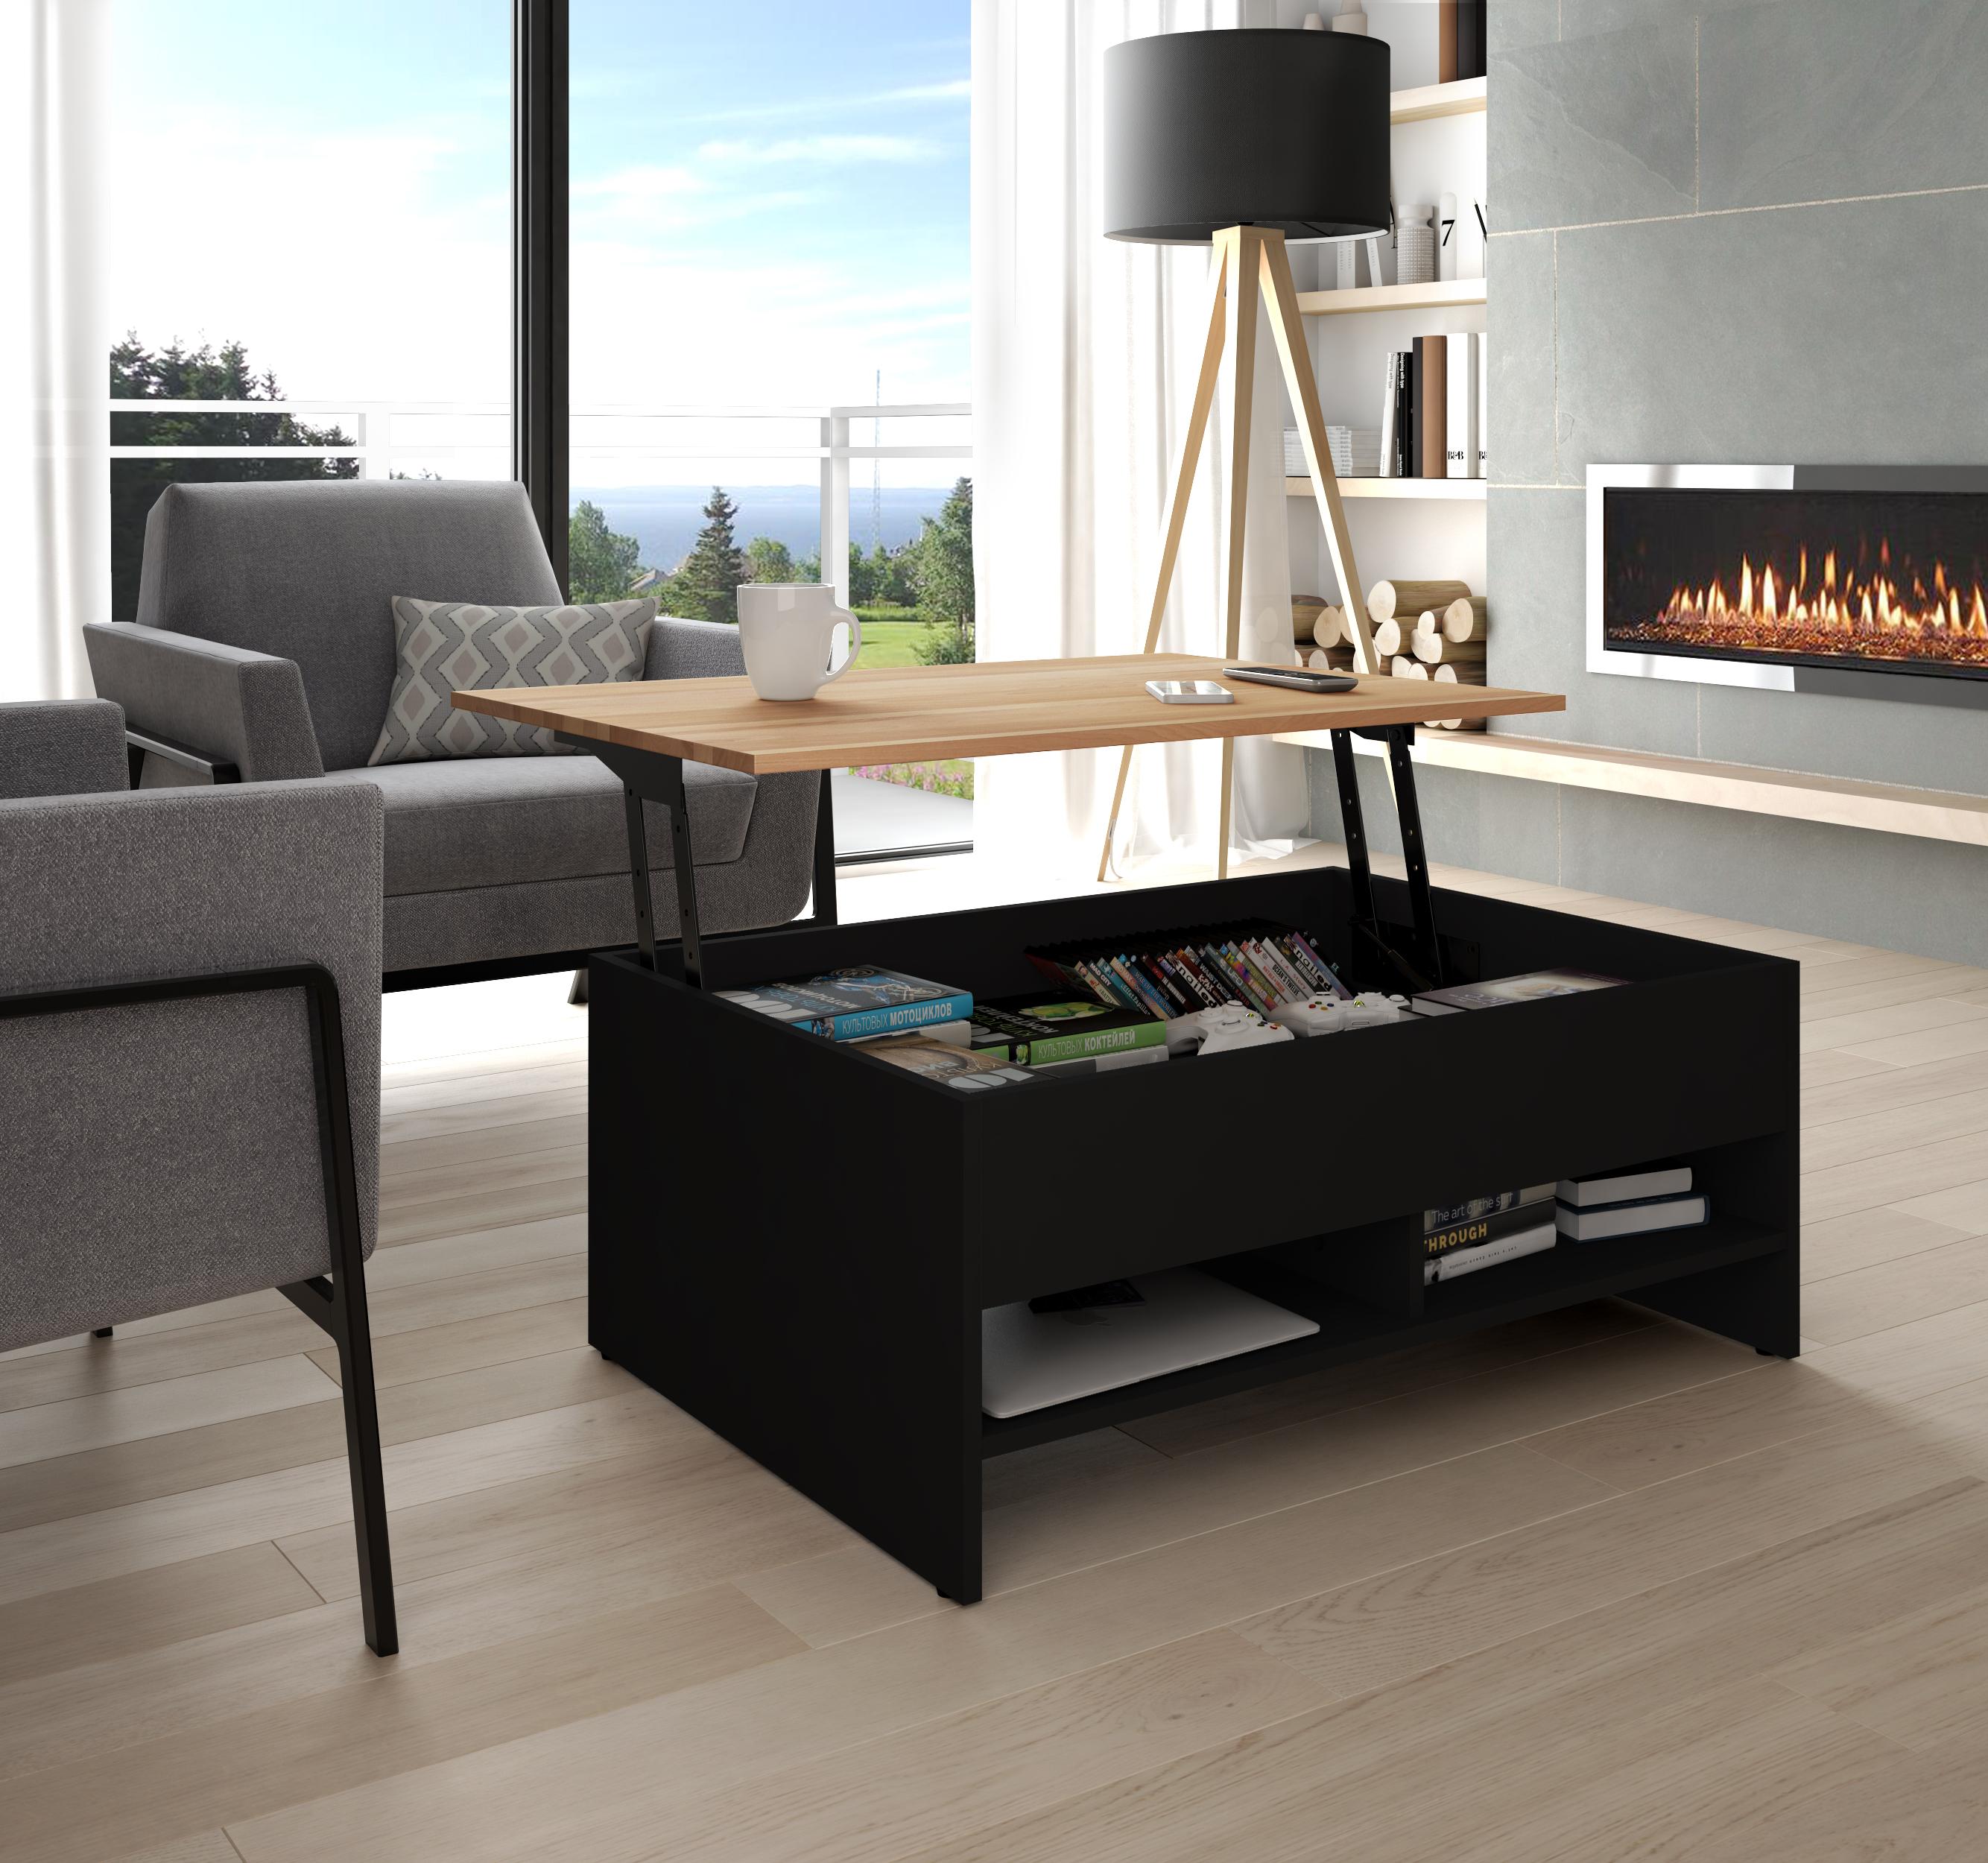 "Black Solid Wood Coffee Table: Bestar Bestar Small Space 37"" Lift-Top Storage Coffee"